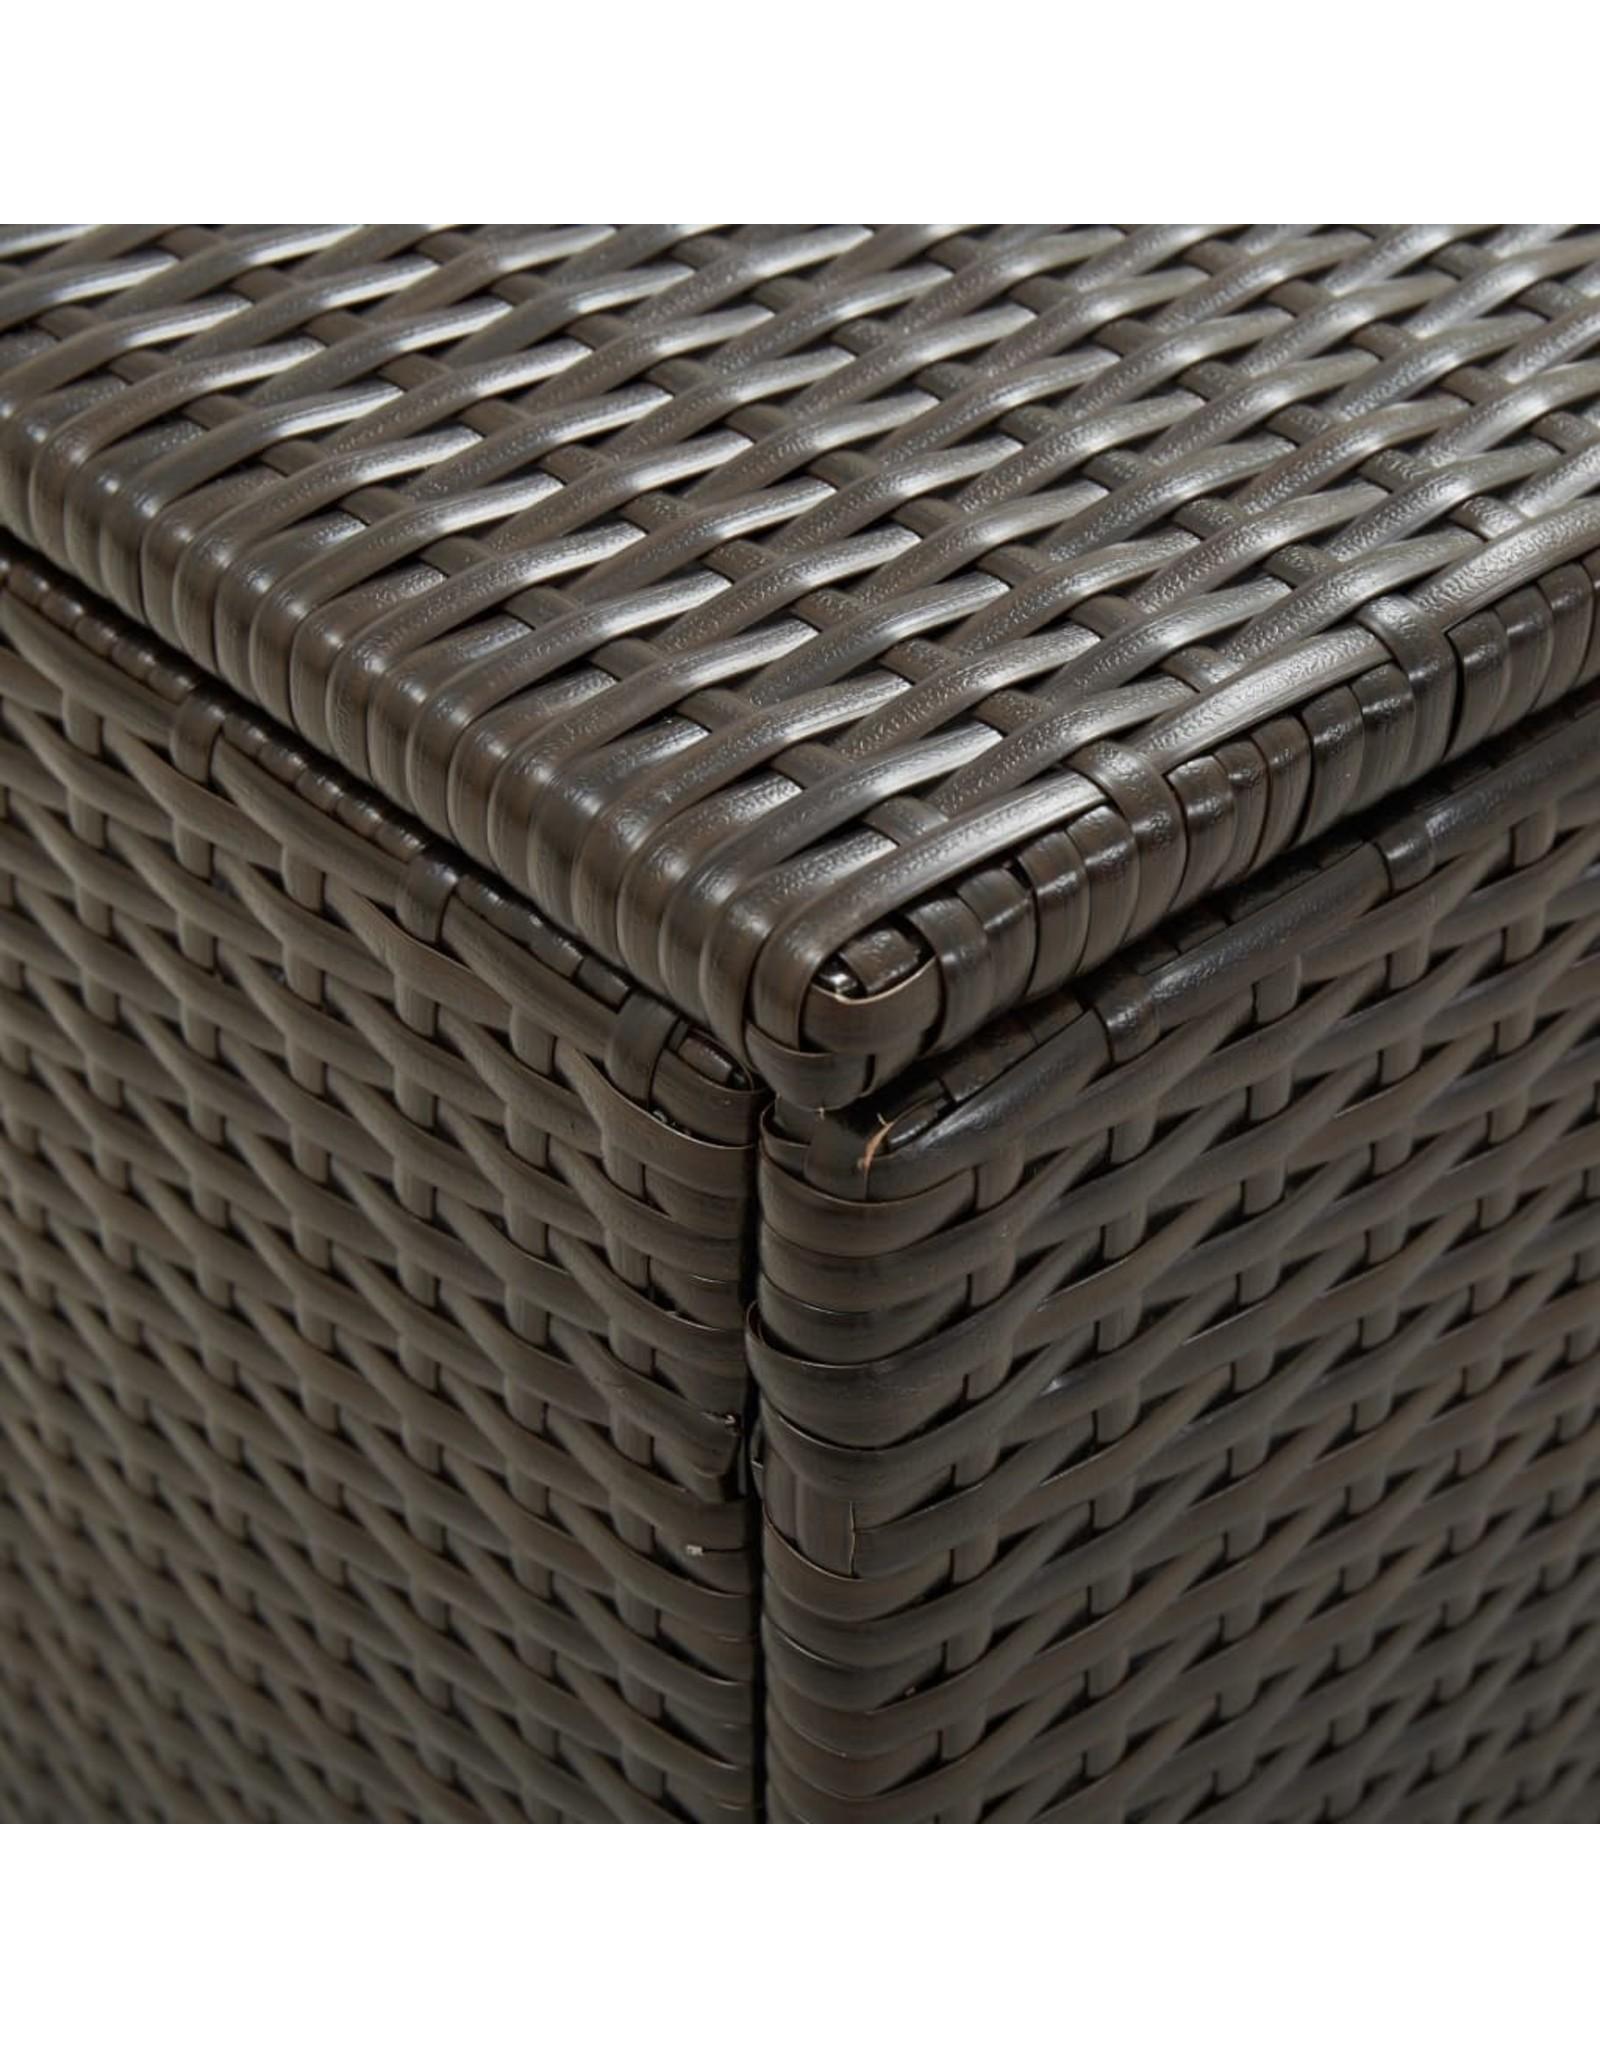 Tuinbox 200x50x60 cm poly rattan bruin